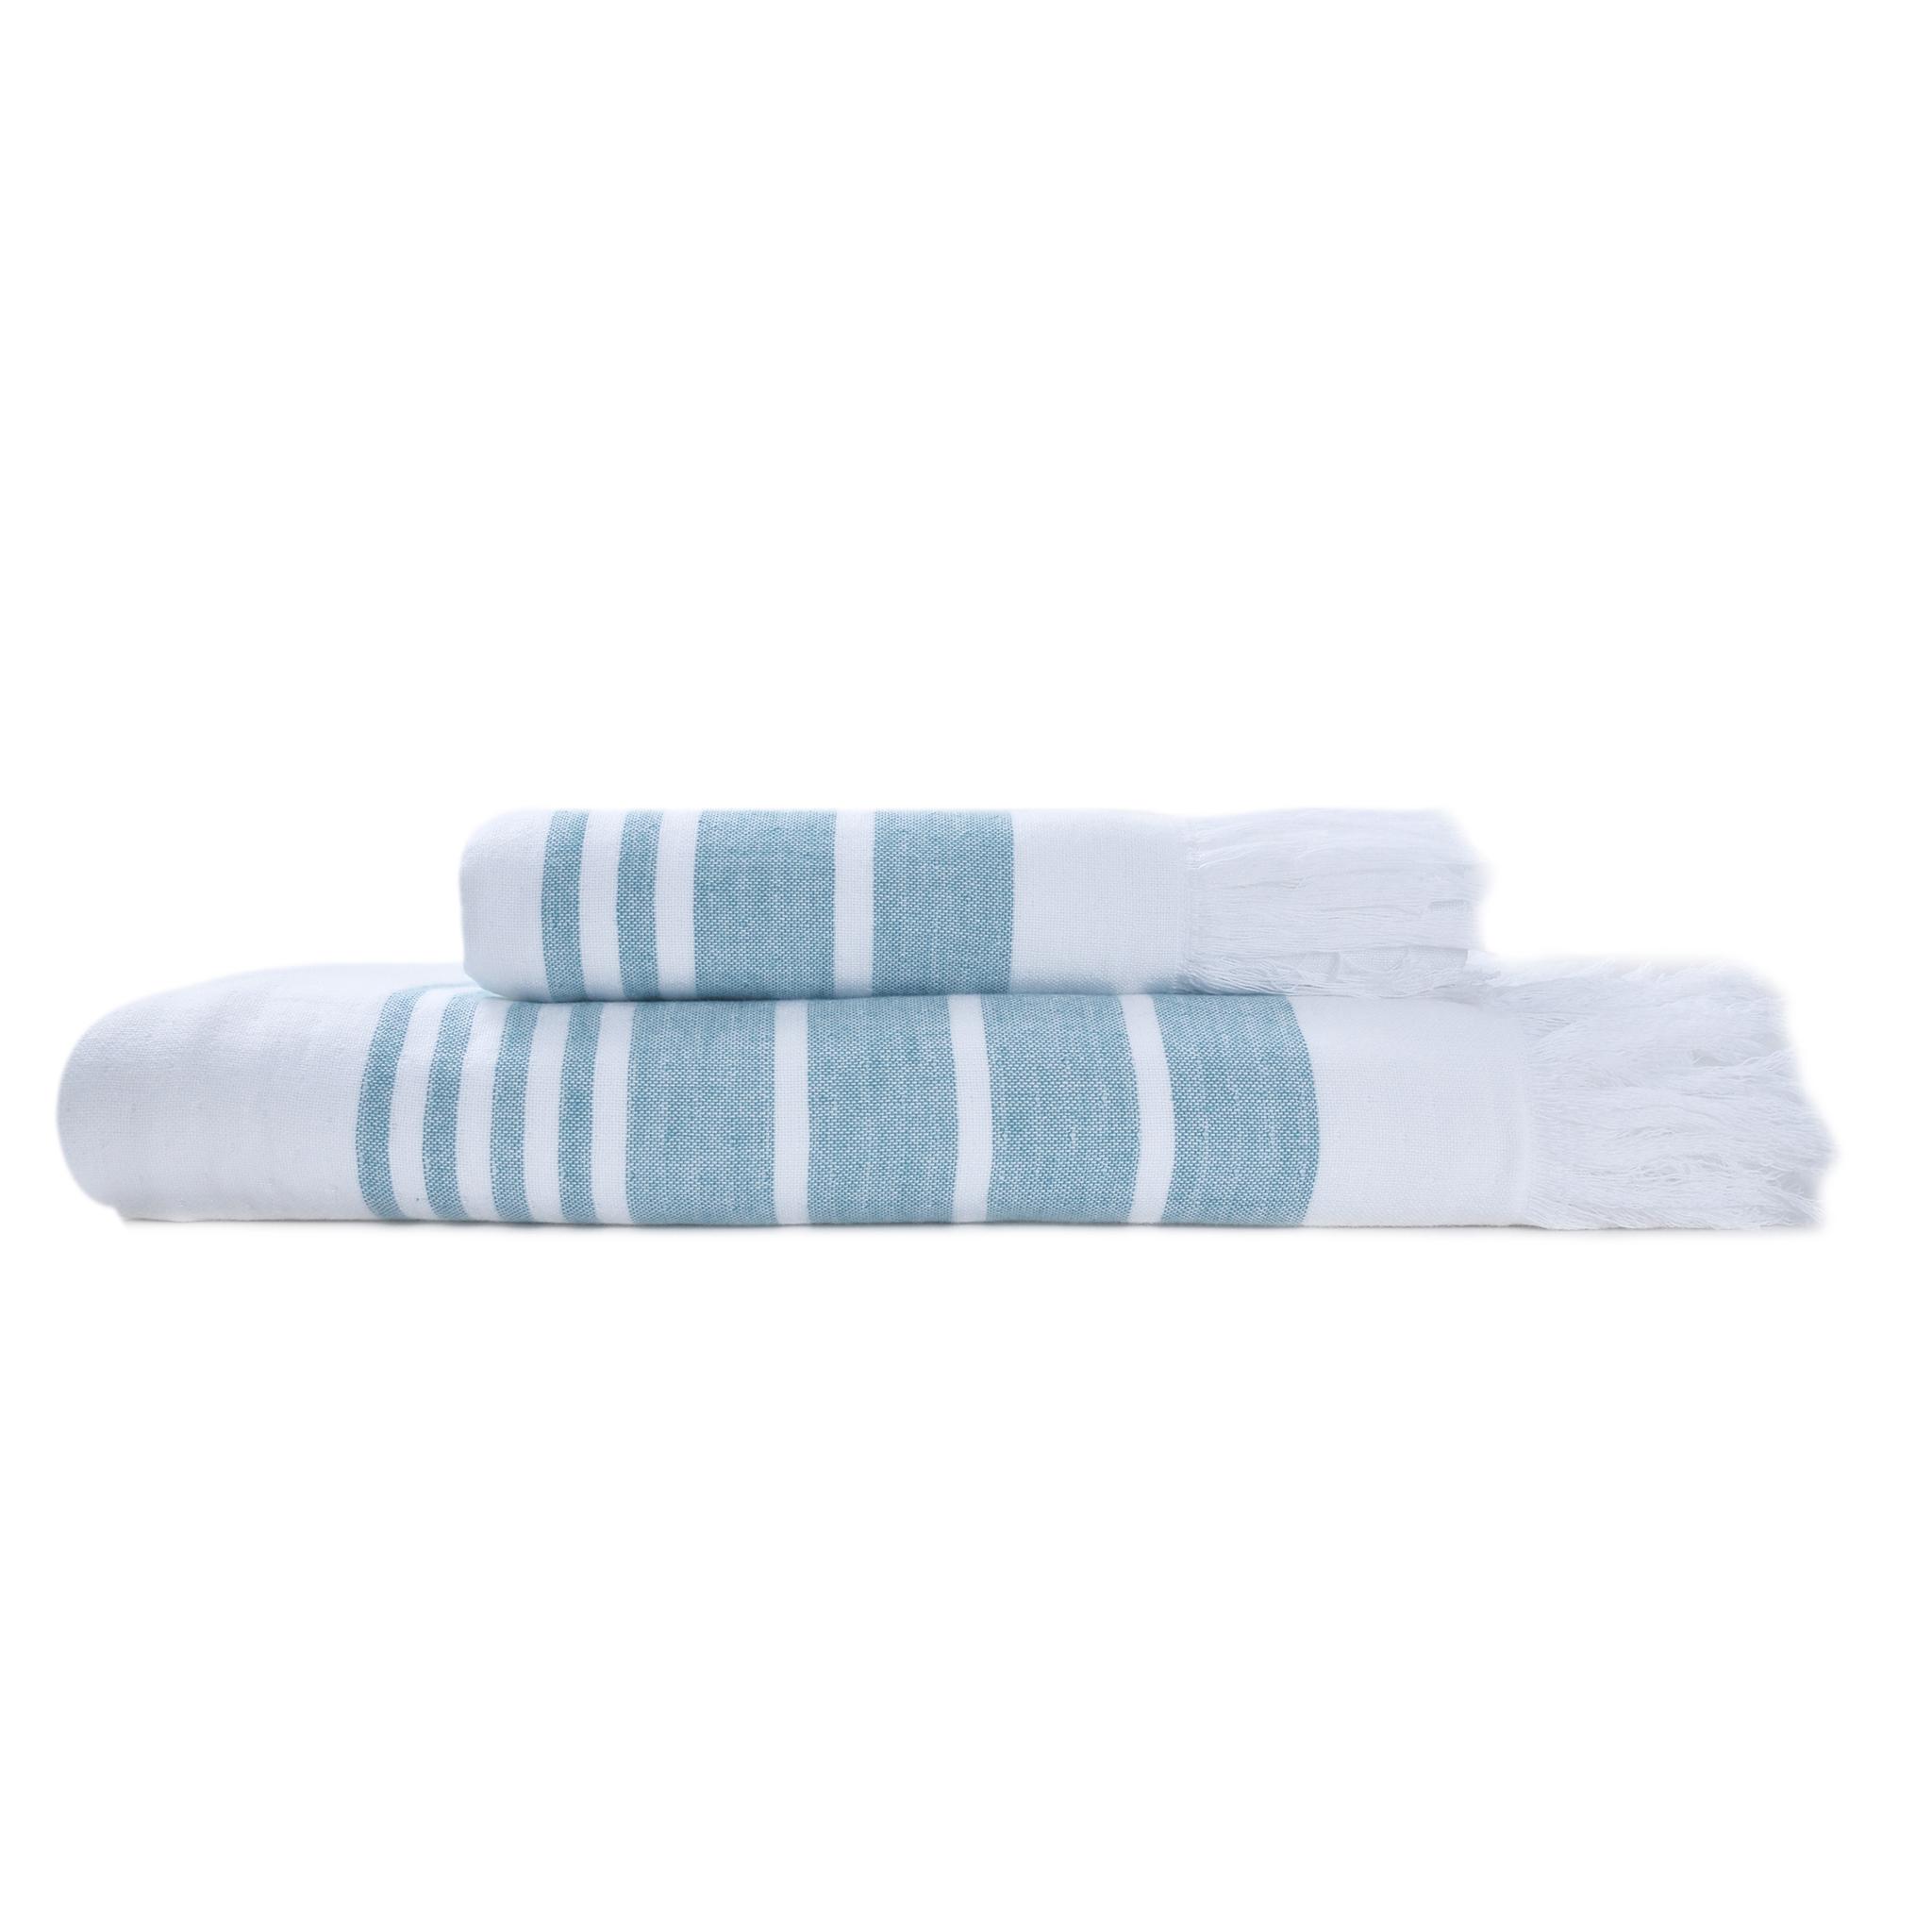 Полотенце 50x100 Hamam Marine Towel бирюзовое